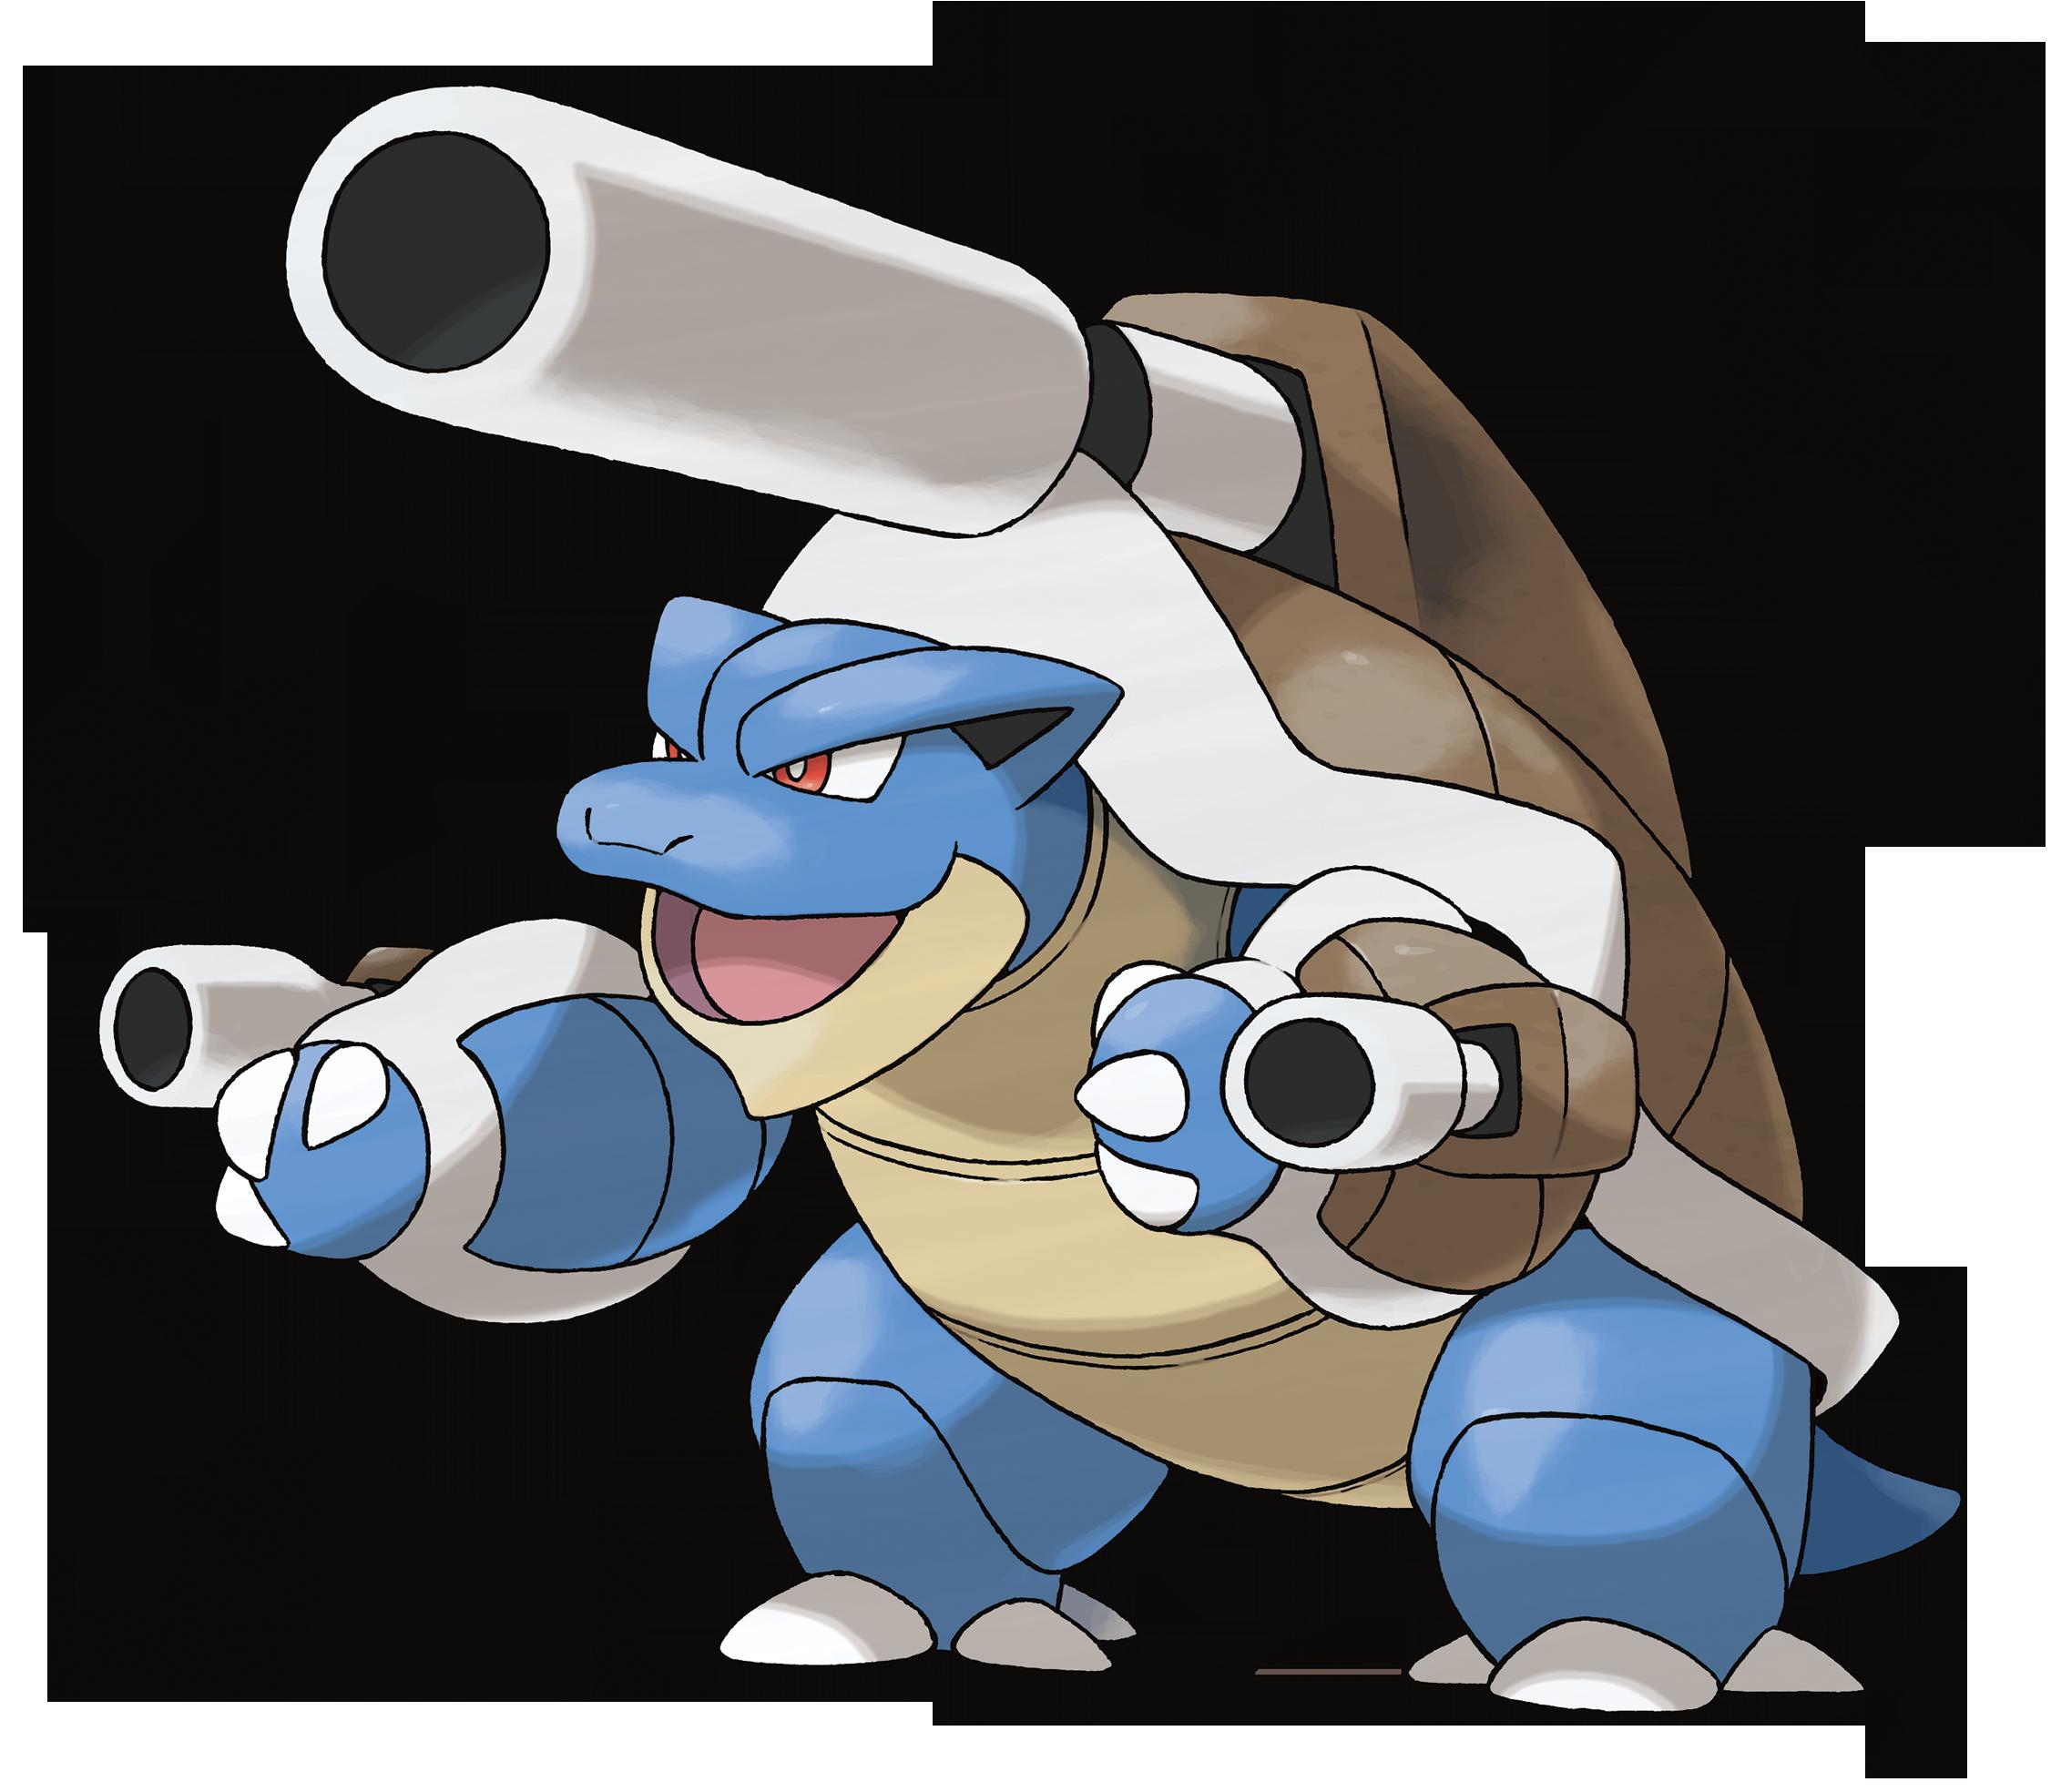 Mega evolution pocketmonsters net - Mega evoulution ...